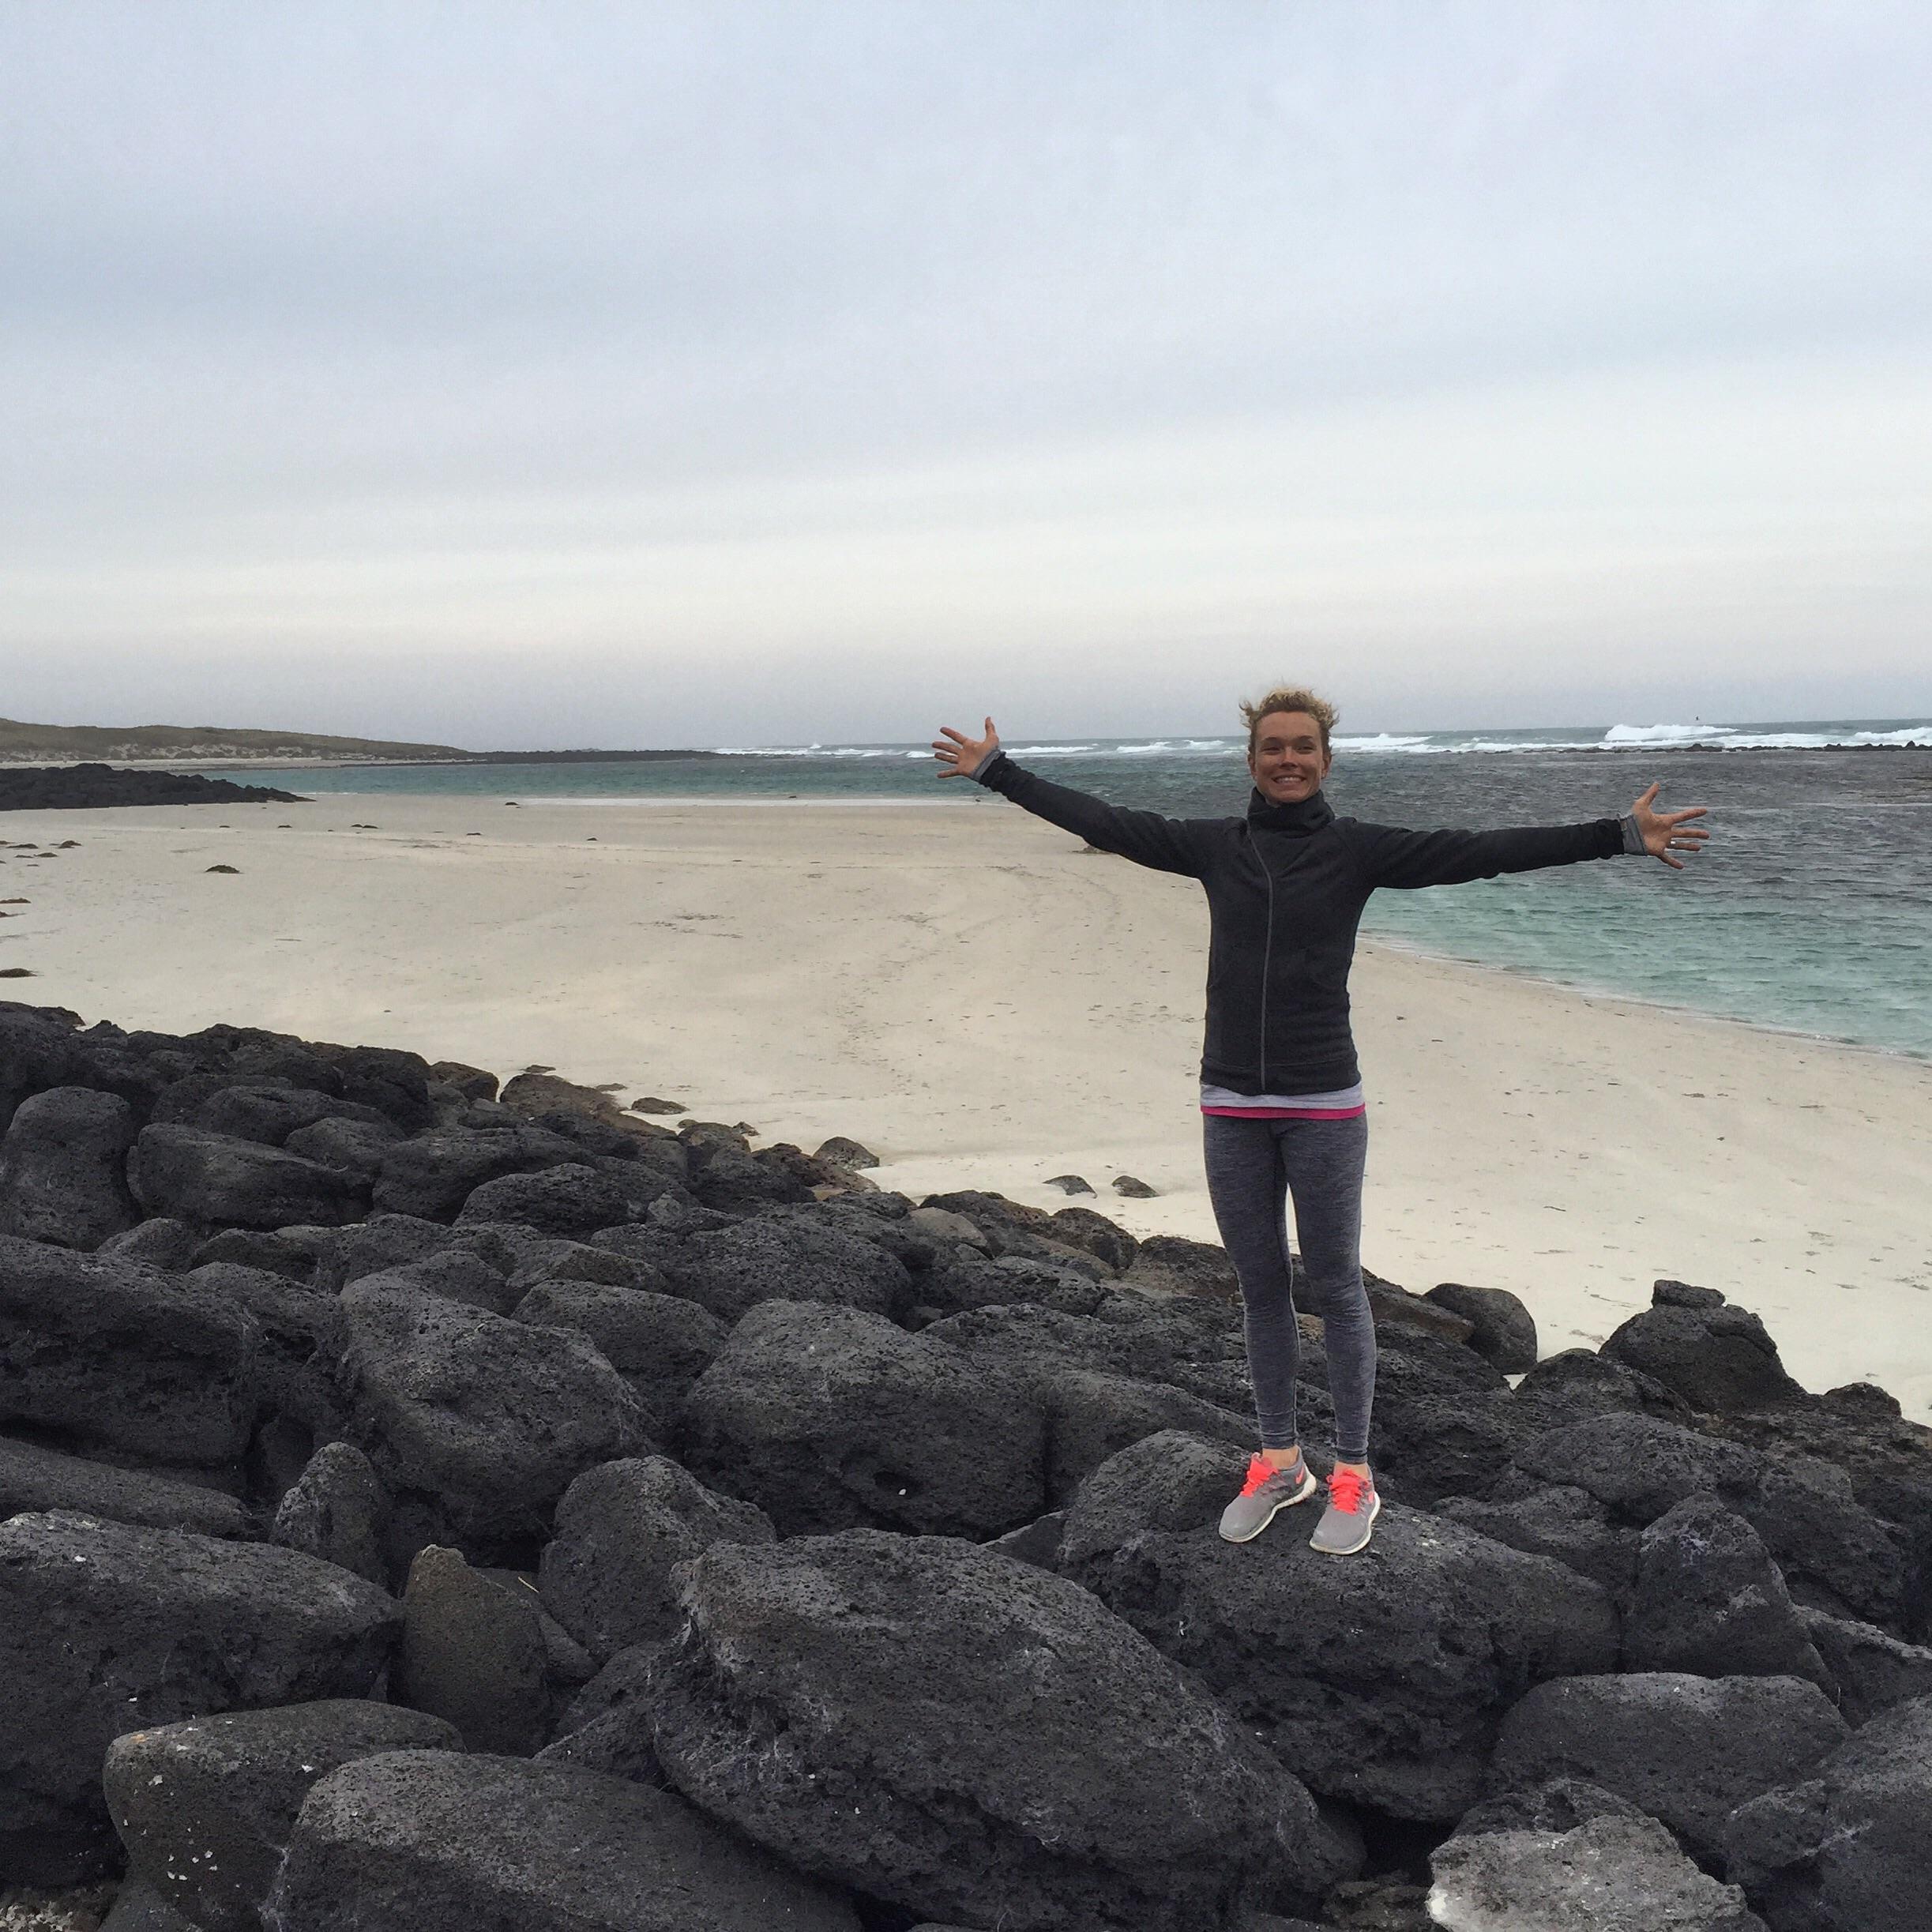 Rock scrambling on the beach!